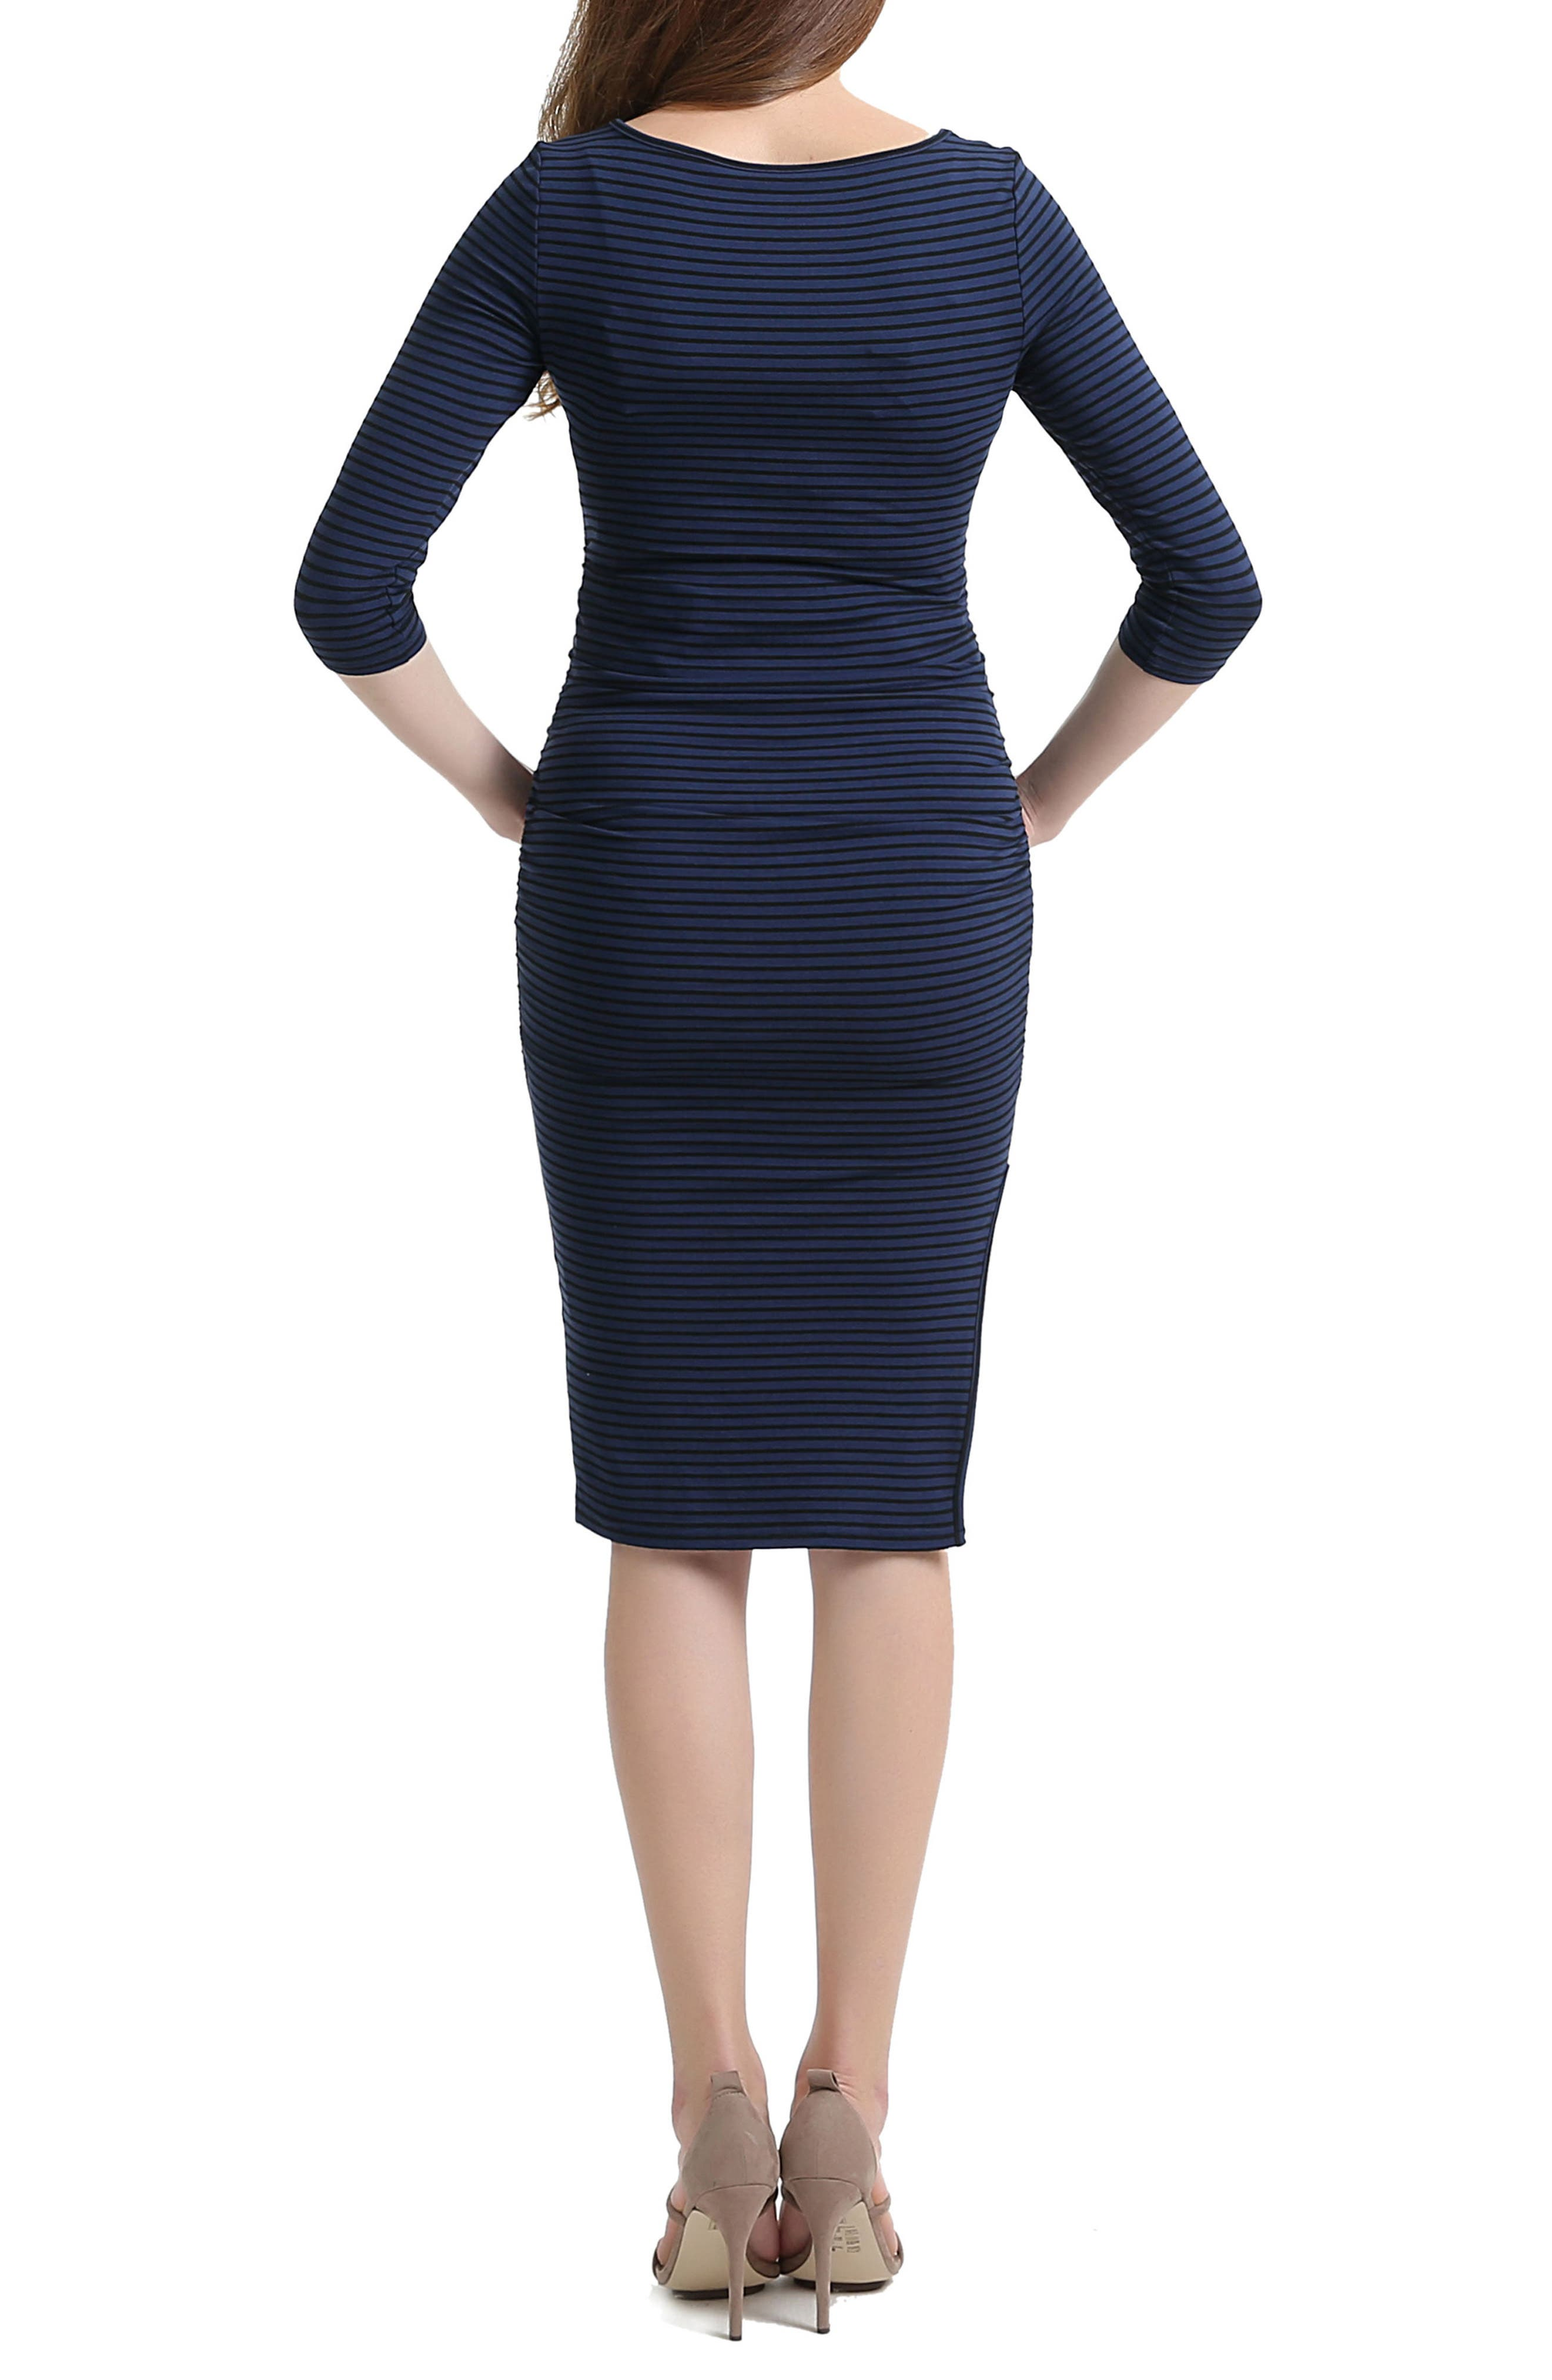 Nora Stripe Maternity Dress,                             Alternate thumbnail 2, color,                             400